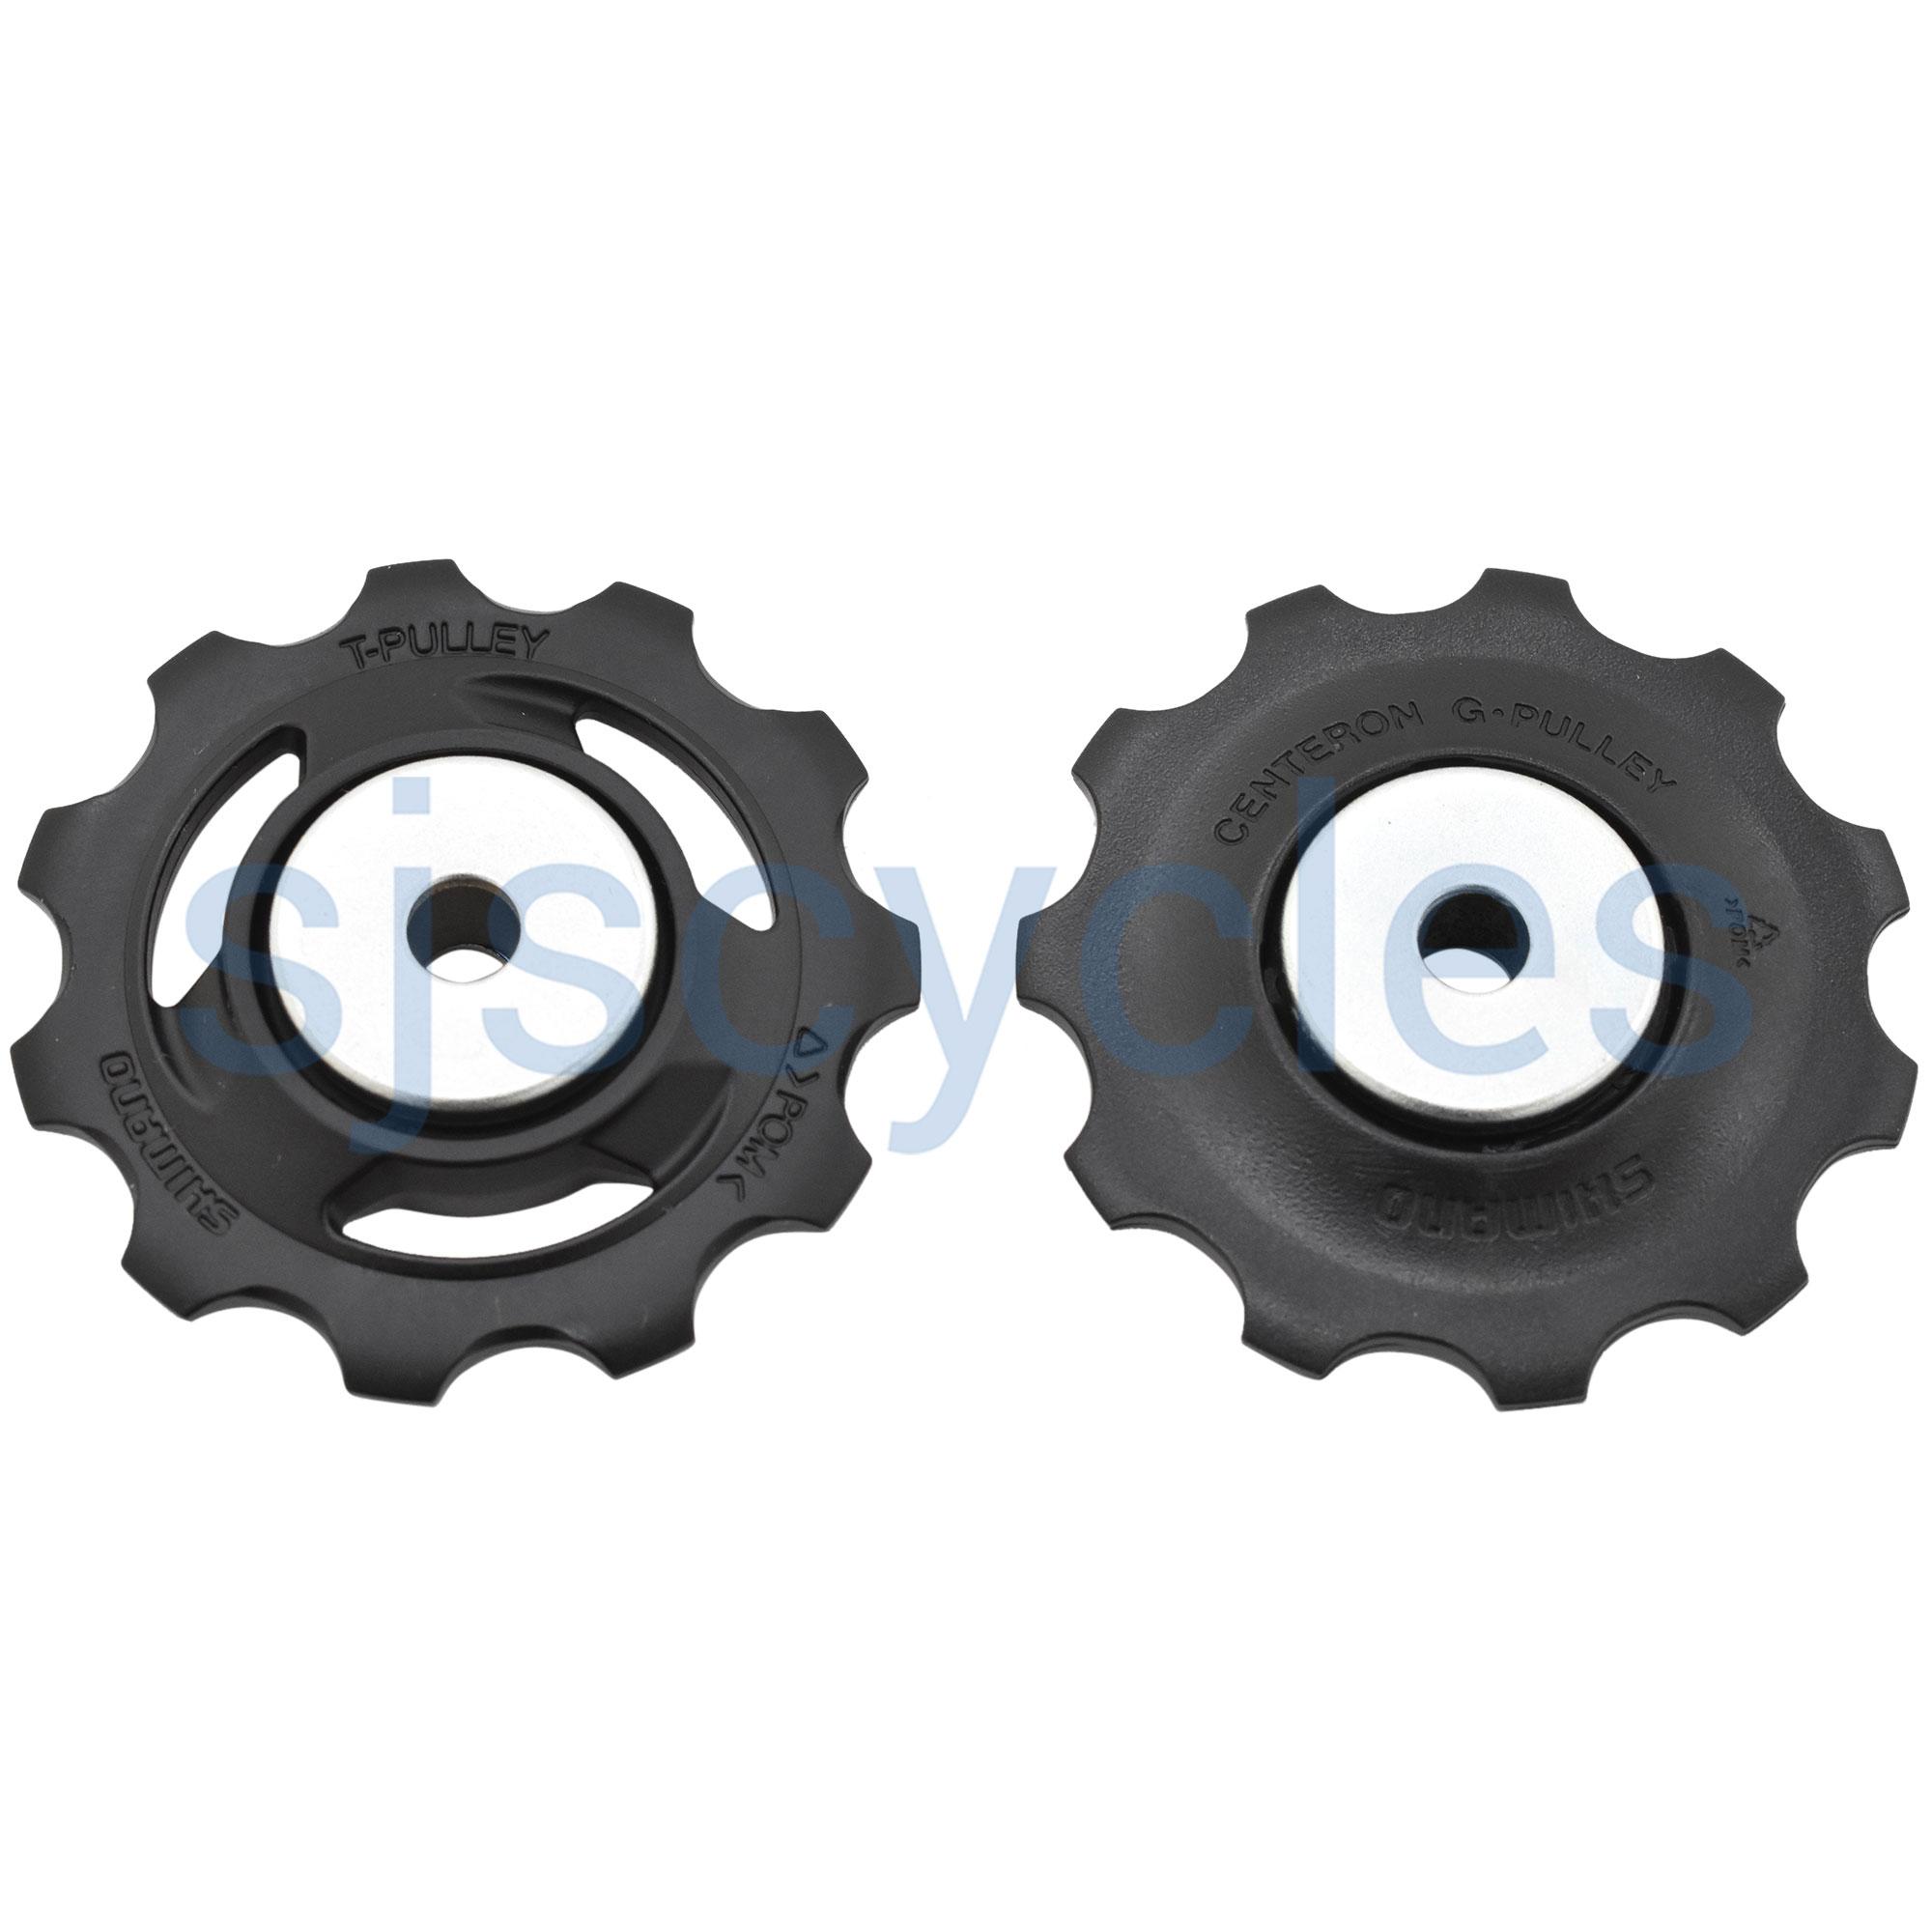 Shimano GRX RD-RX400 10 Speed Jockey Wheels